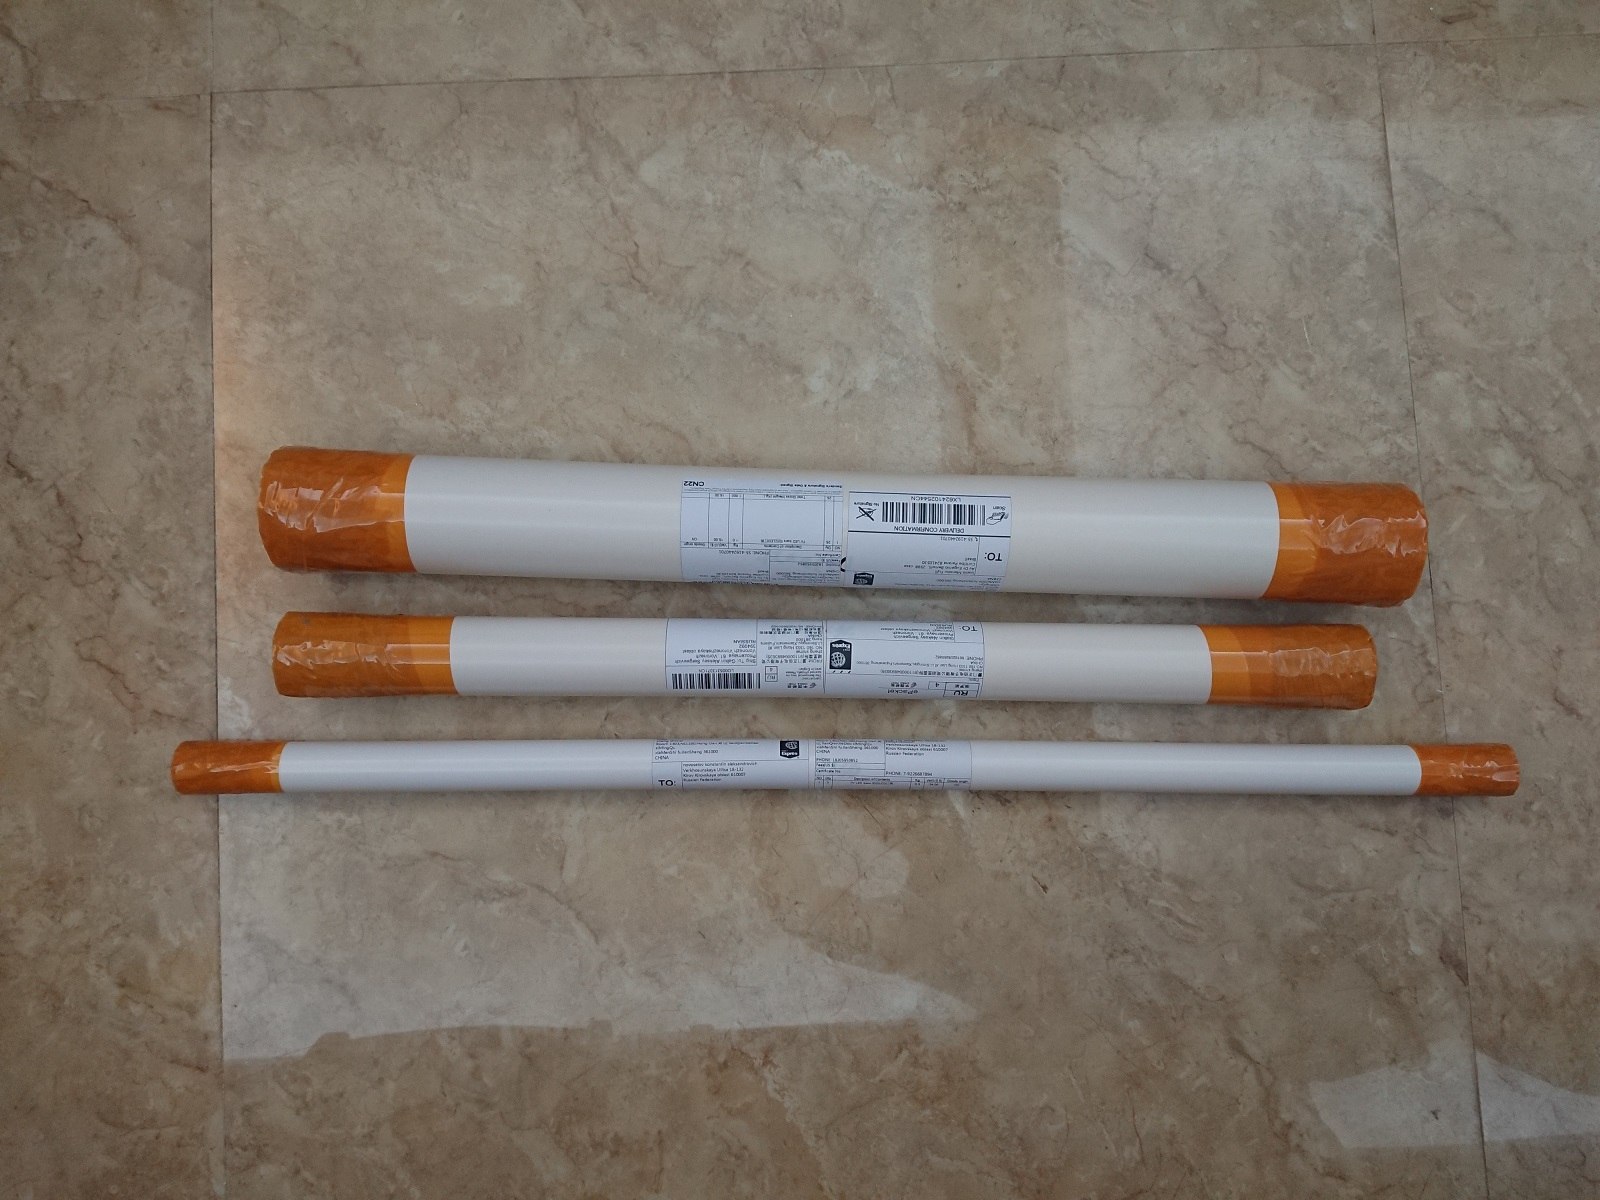 Image 5 - 3 PCS LED strip for LG 32LB5800 32LF560V LGIT UOT A B 6916L 1974A 1975A 6916L 2223A 2224A innotek DRT 3.0 32 WROOEE 0418D 0419Dstripstrip ledstrip a led -